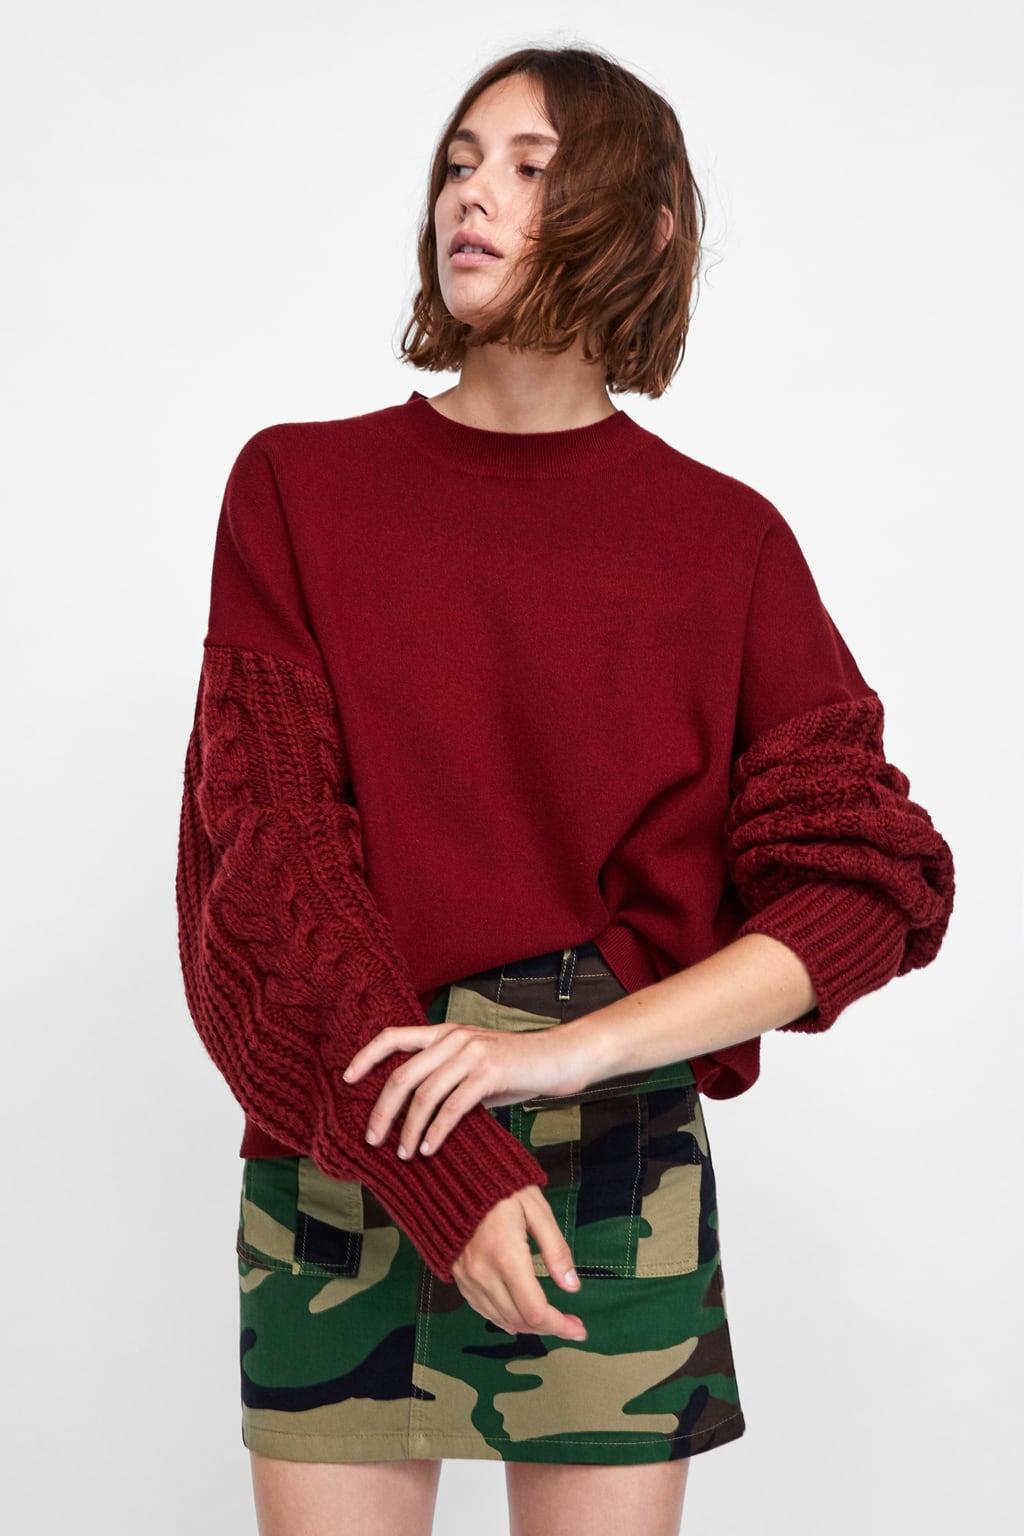 Un jersey de punto rojo 44c46096695d